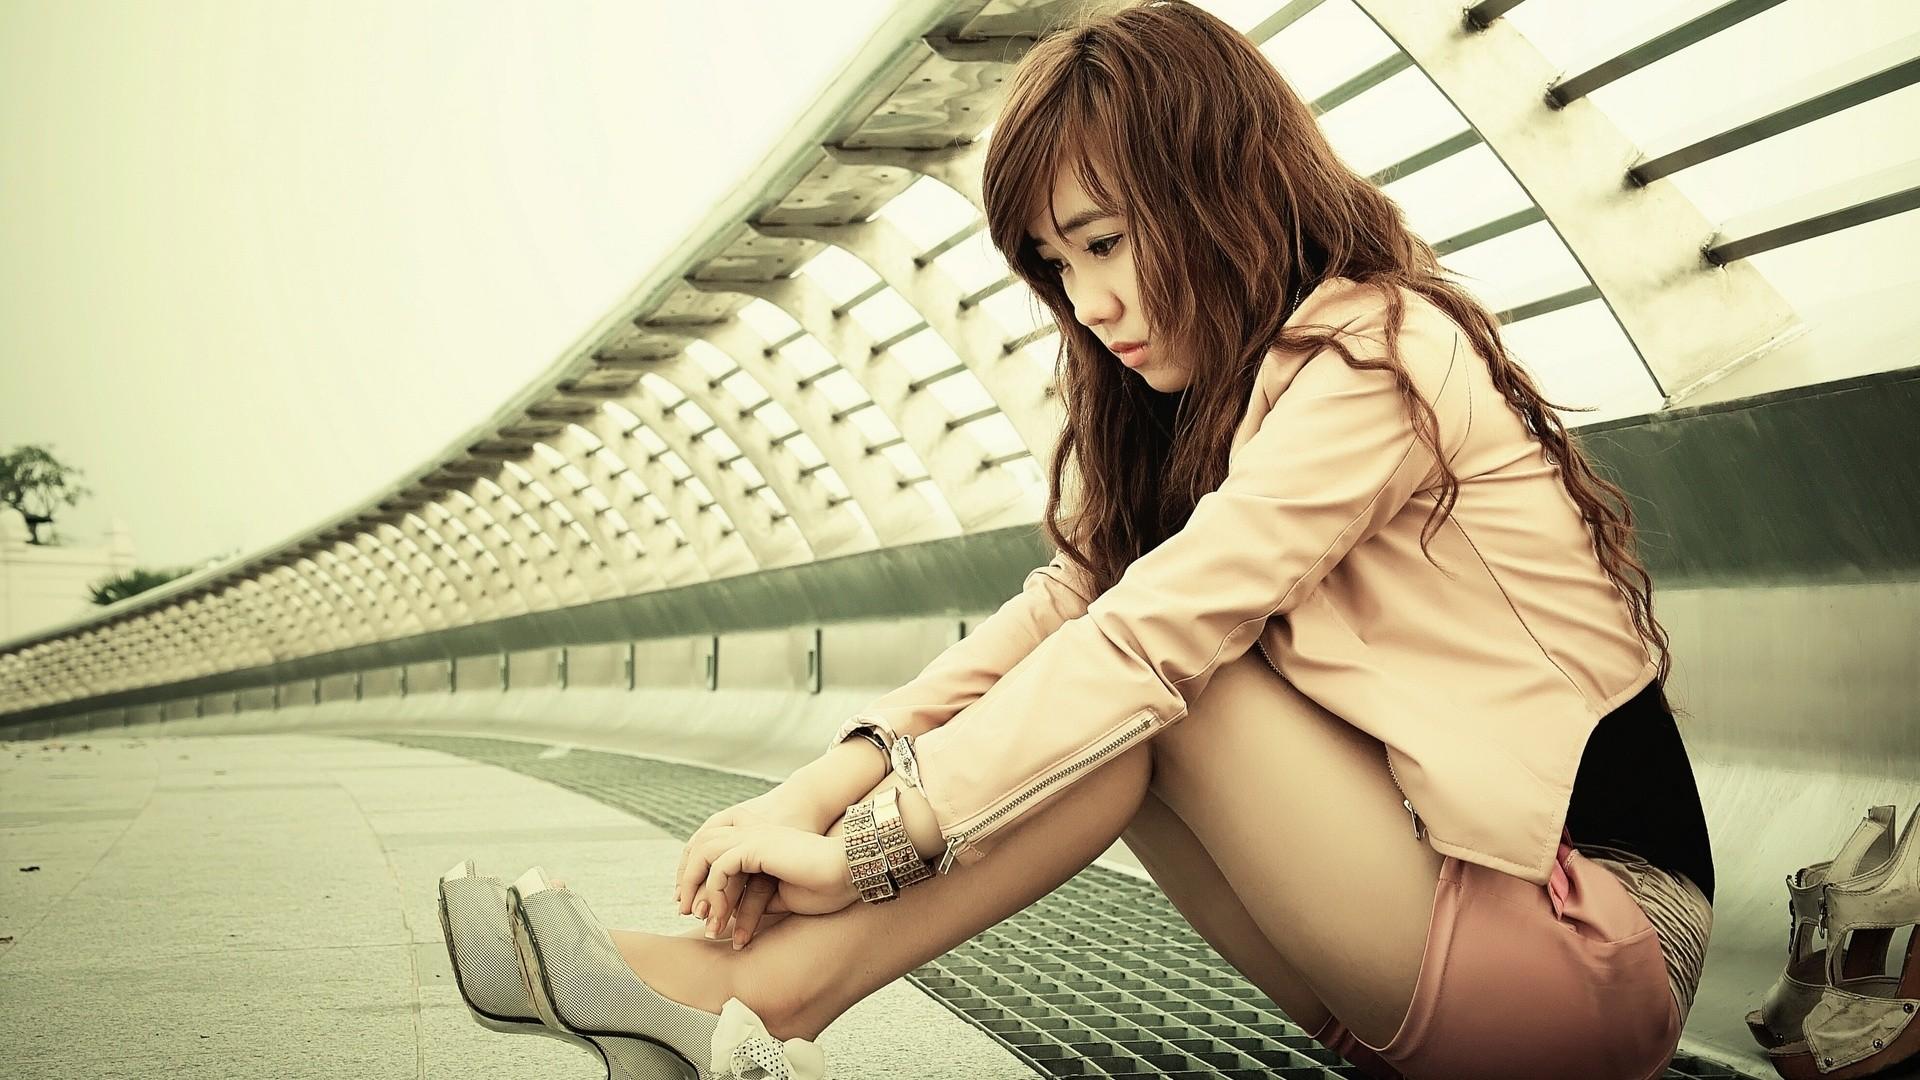 People 1920x1080 women Asian high heels sitting shorts leather jackets brunette bracelets long hair sadness women outdoors